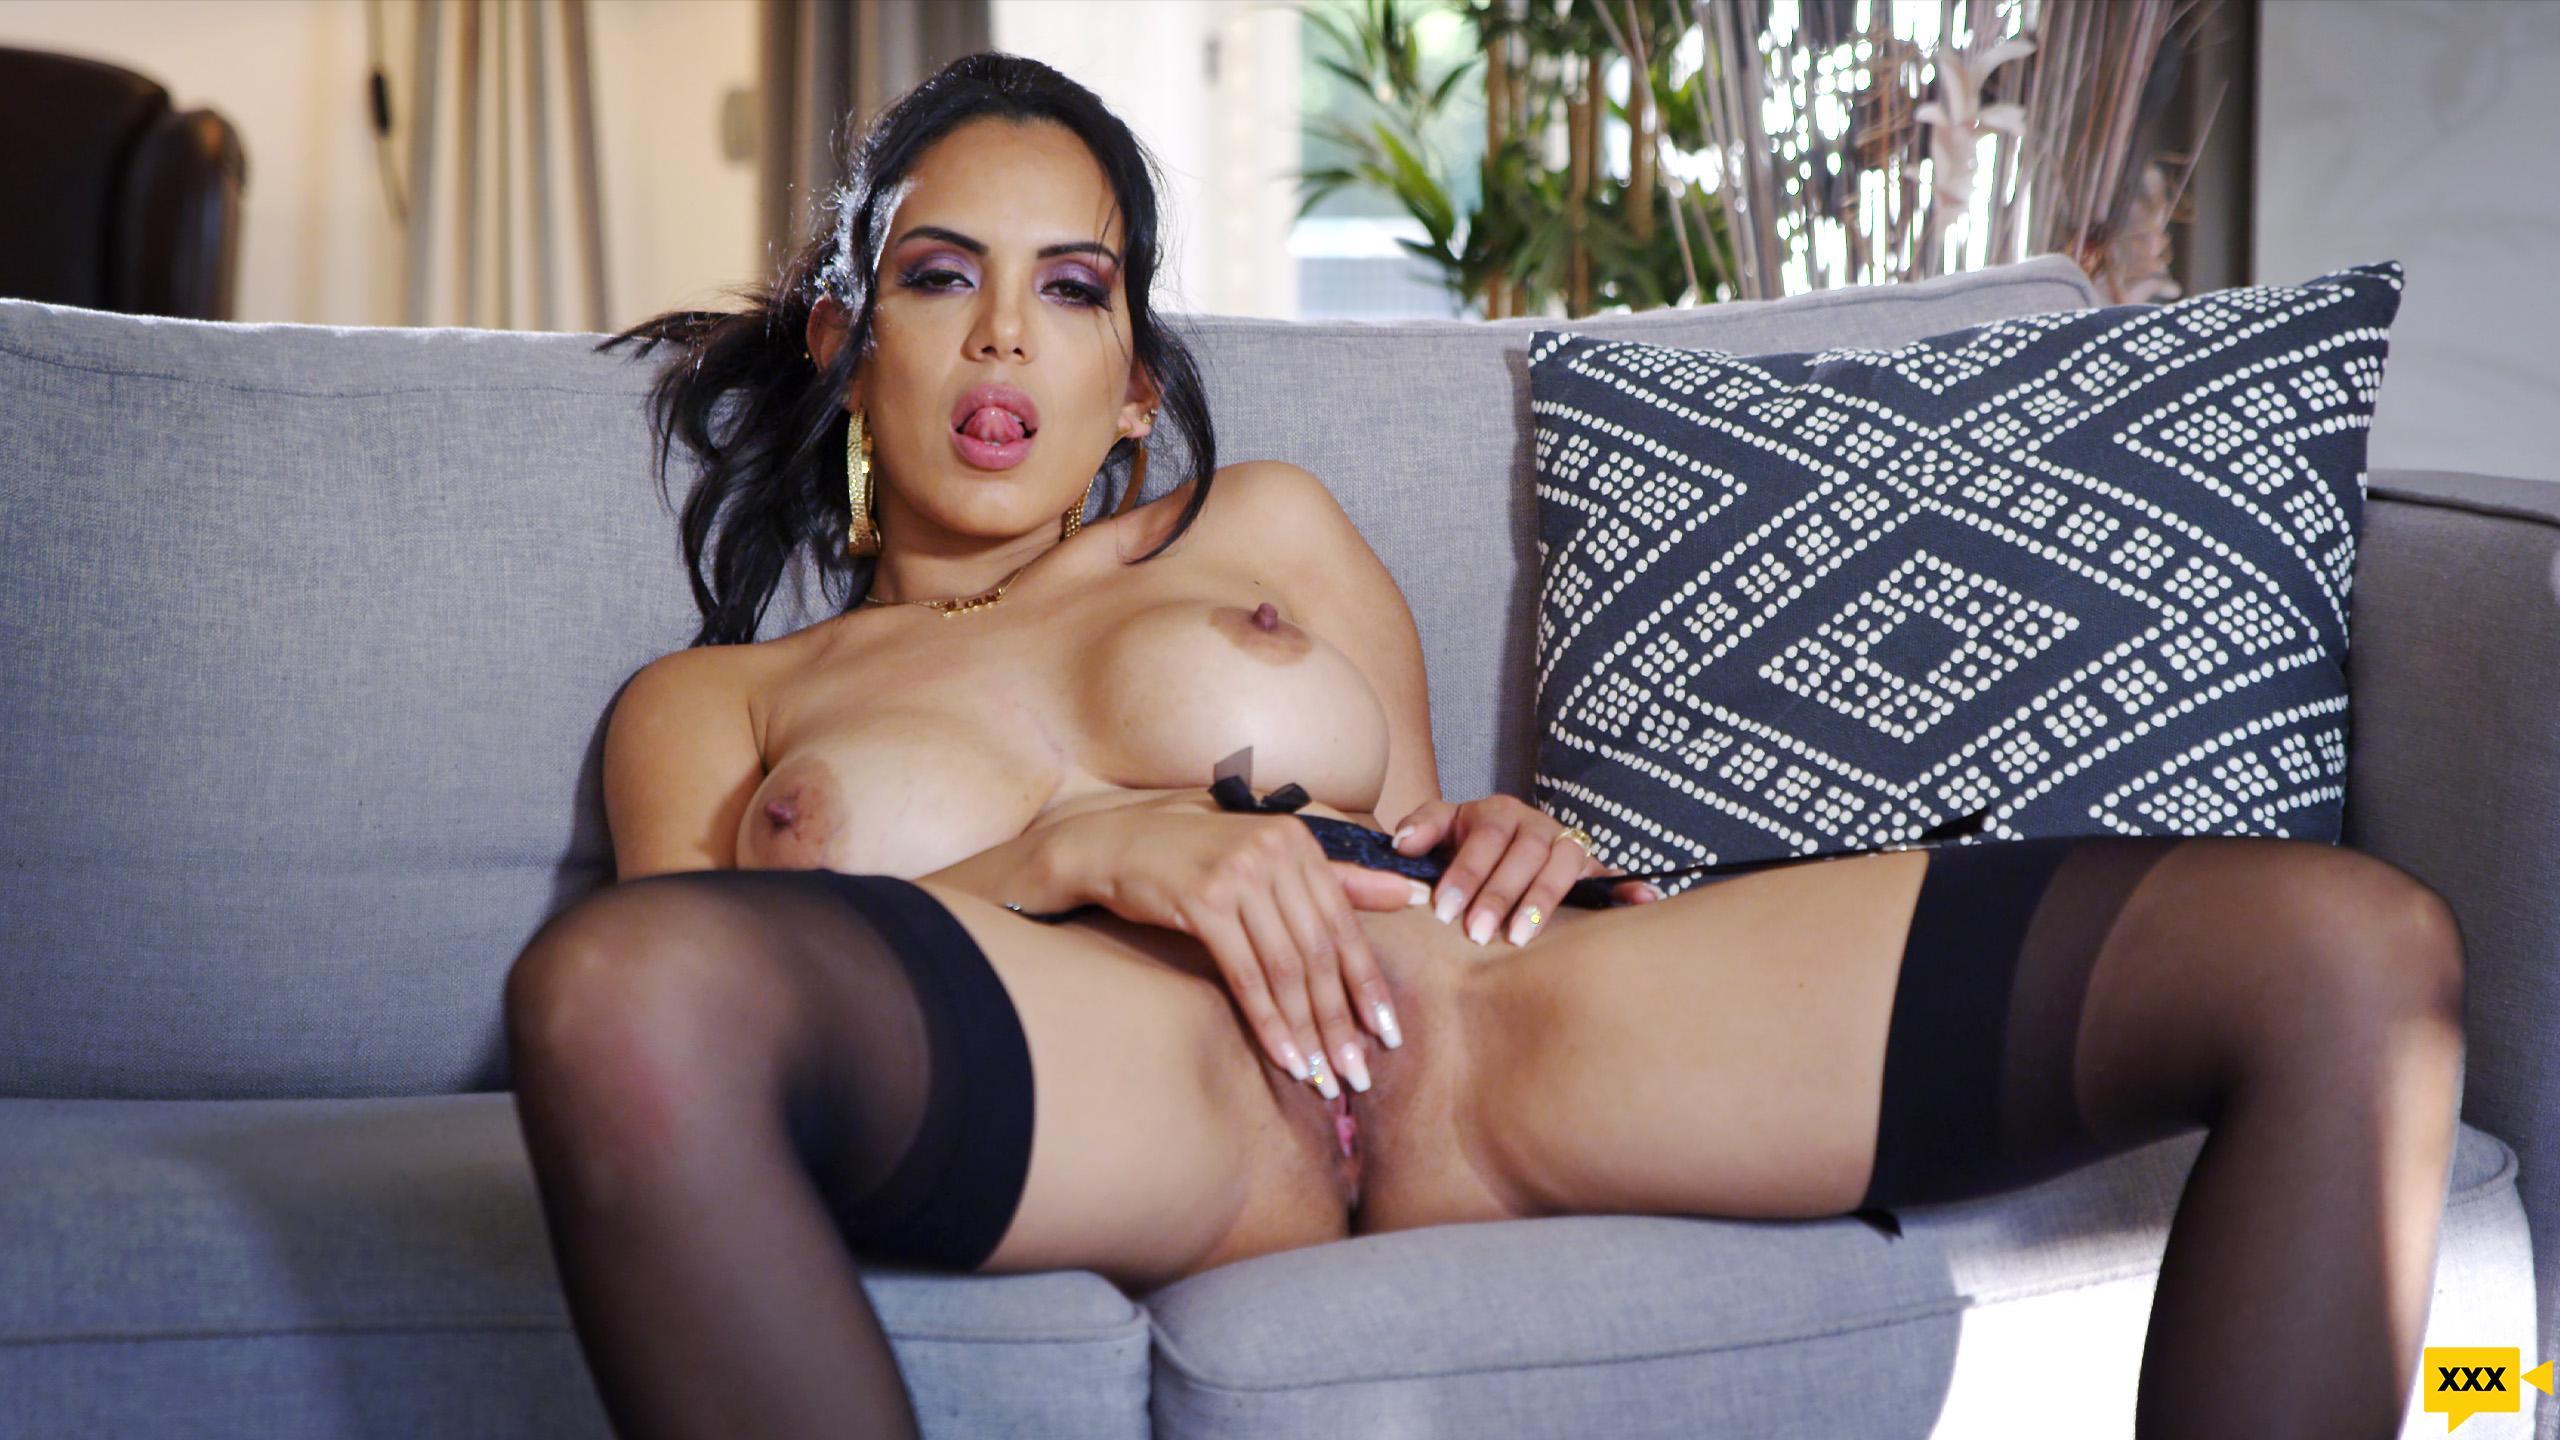 [18+] 5K Porn – Katrina Moreno XXX 430MB